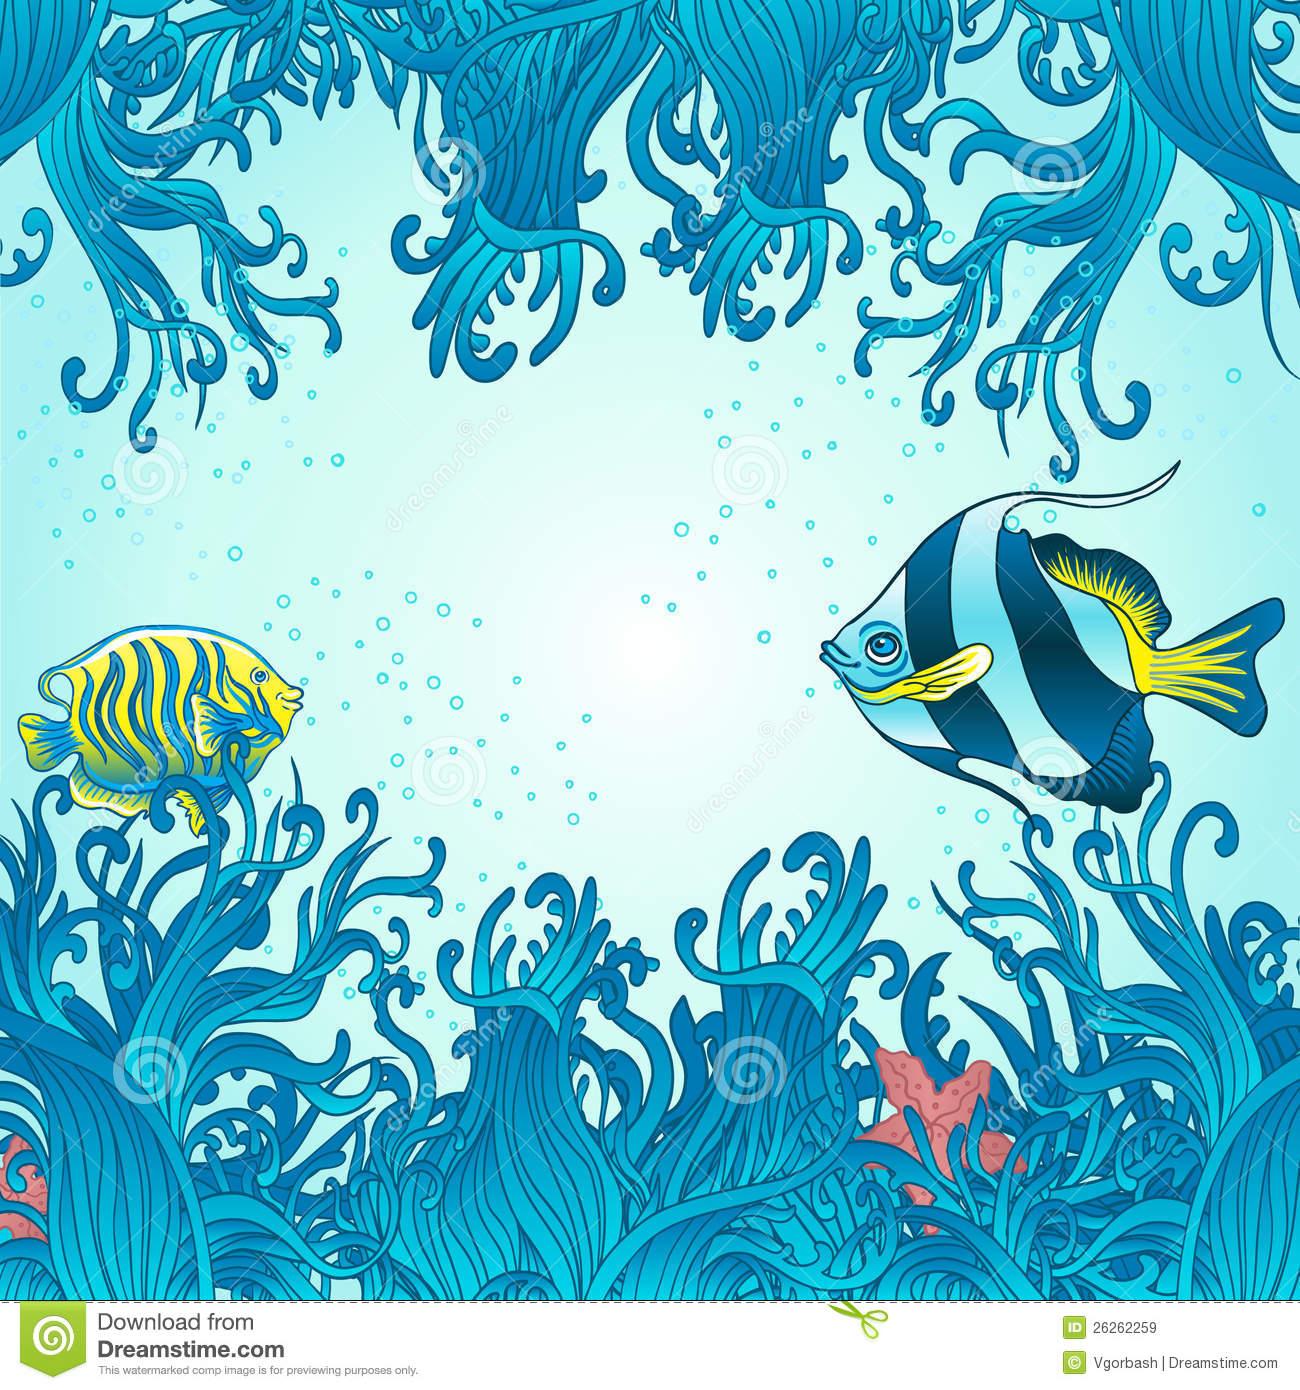 Sea Fish Background Royalty Free Stock Images - Image: 26262259